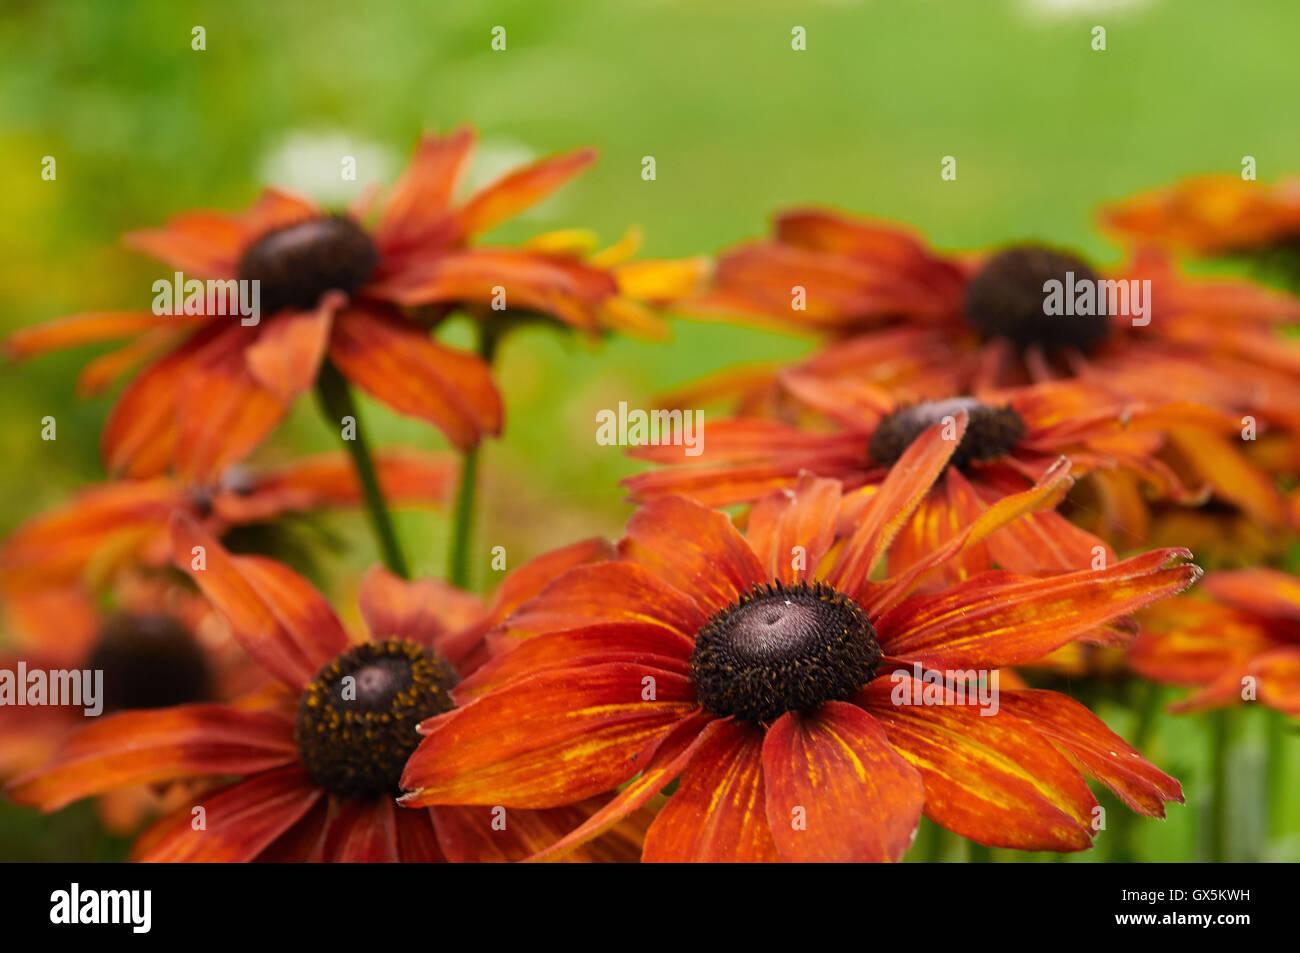 Beautiful Summer Flowers In Full Bloom Stock Photo 119368637 Alamy